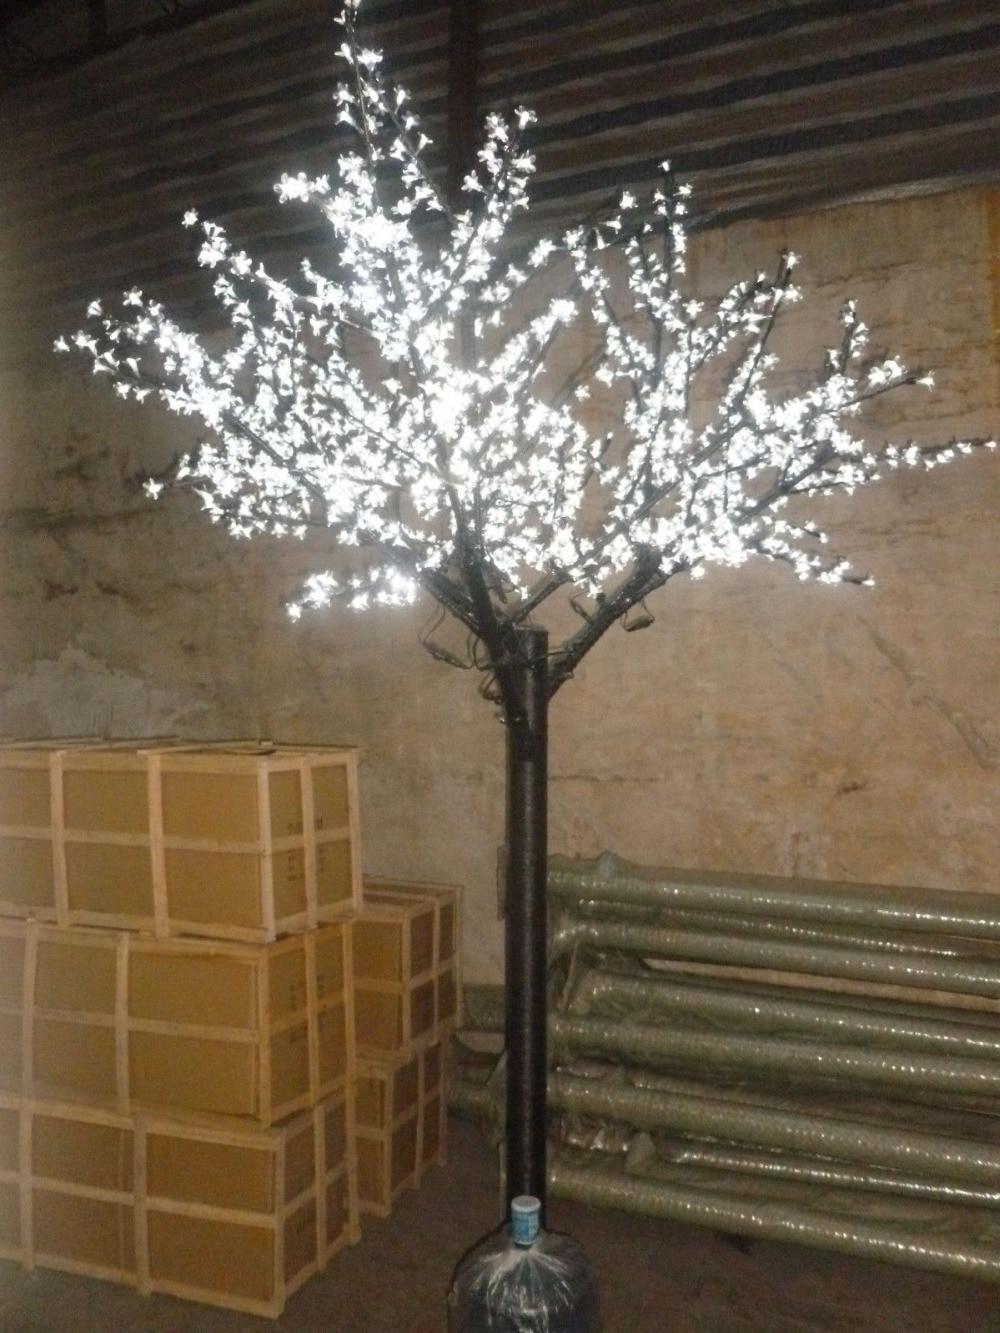 2M 6.6ft LED Cherry Blossom Tree Outdoor Indoor Christmas Wedding Garden Holiday Light Decor 1000LEDs waterproof 7 Colors option цена